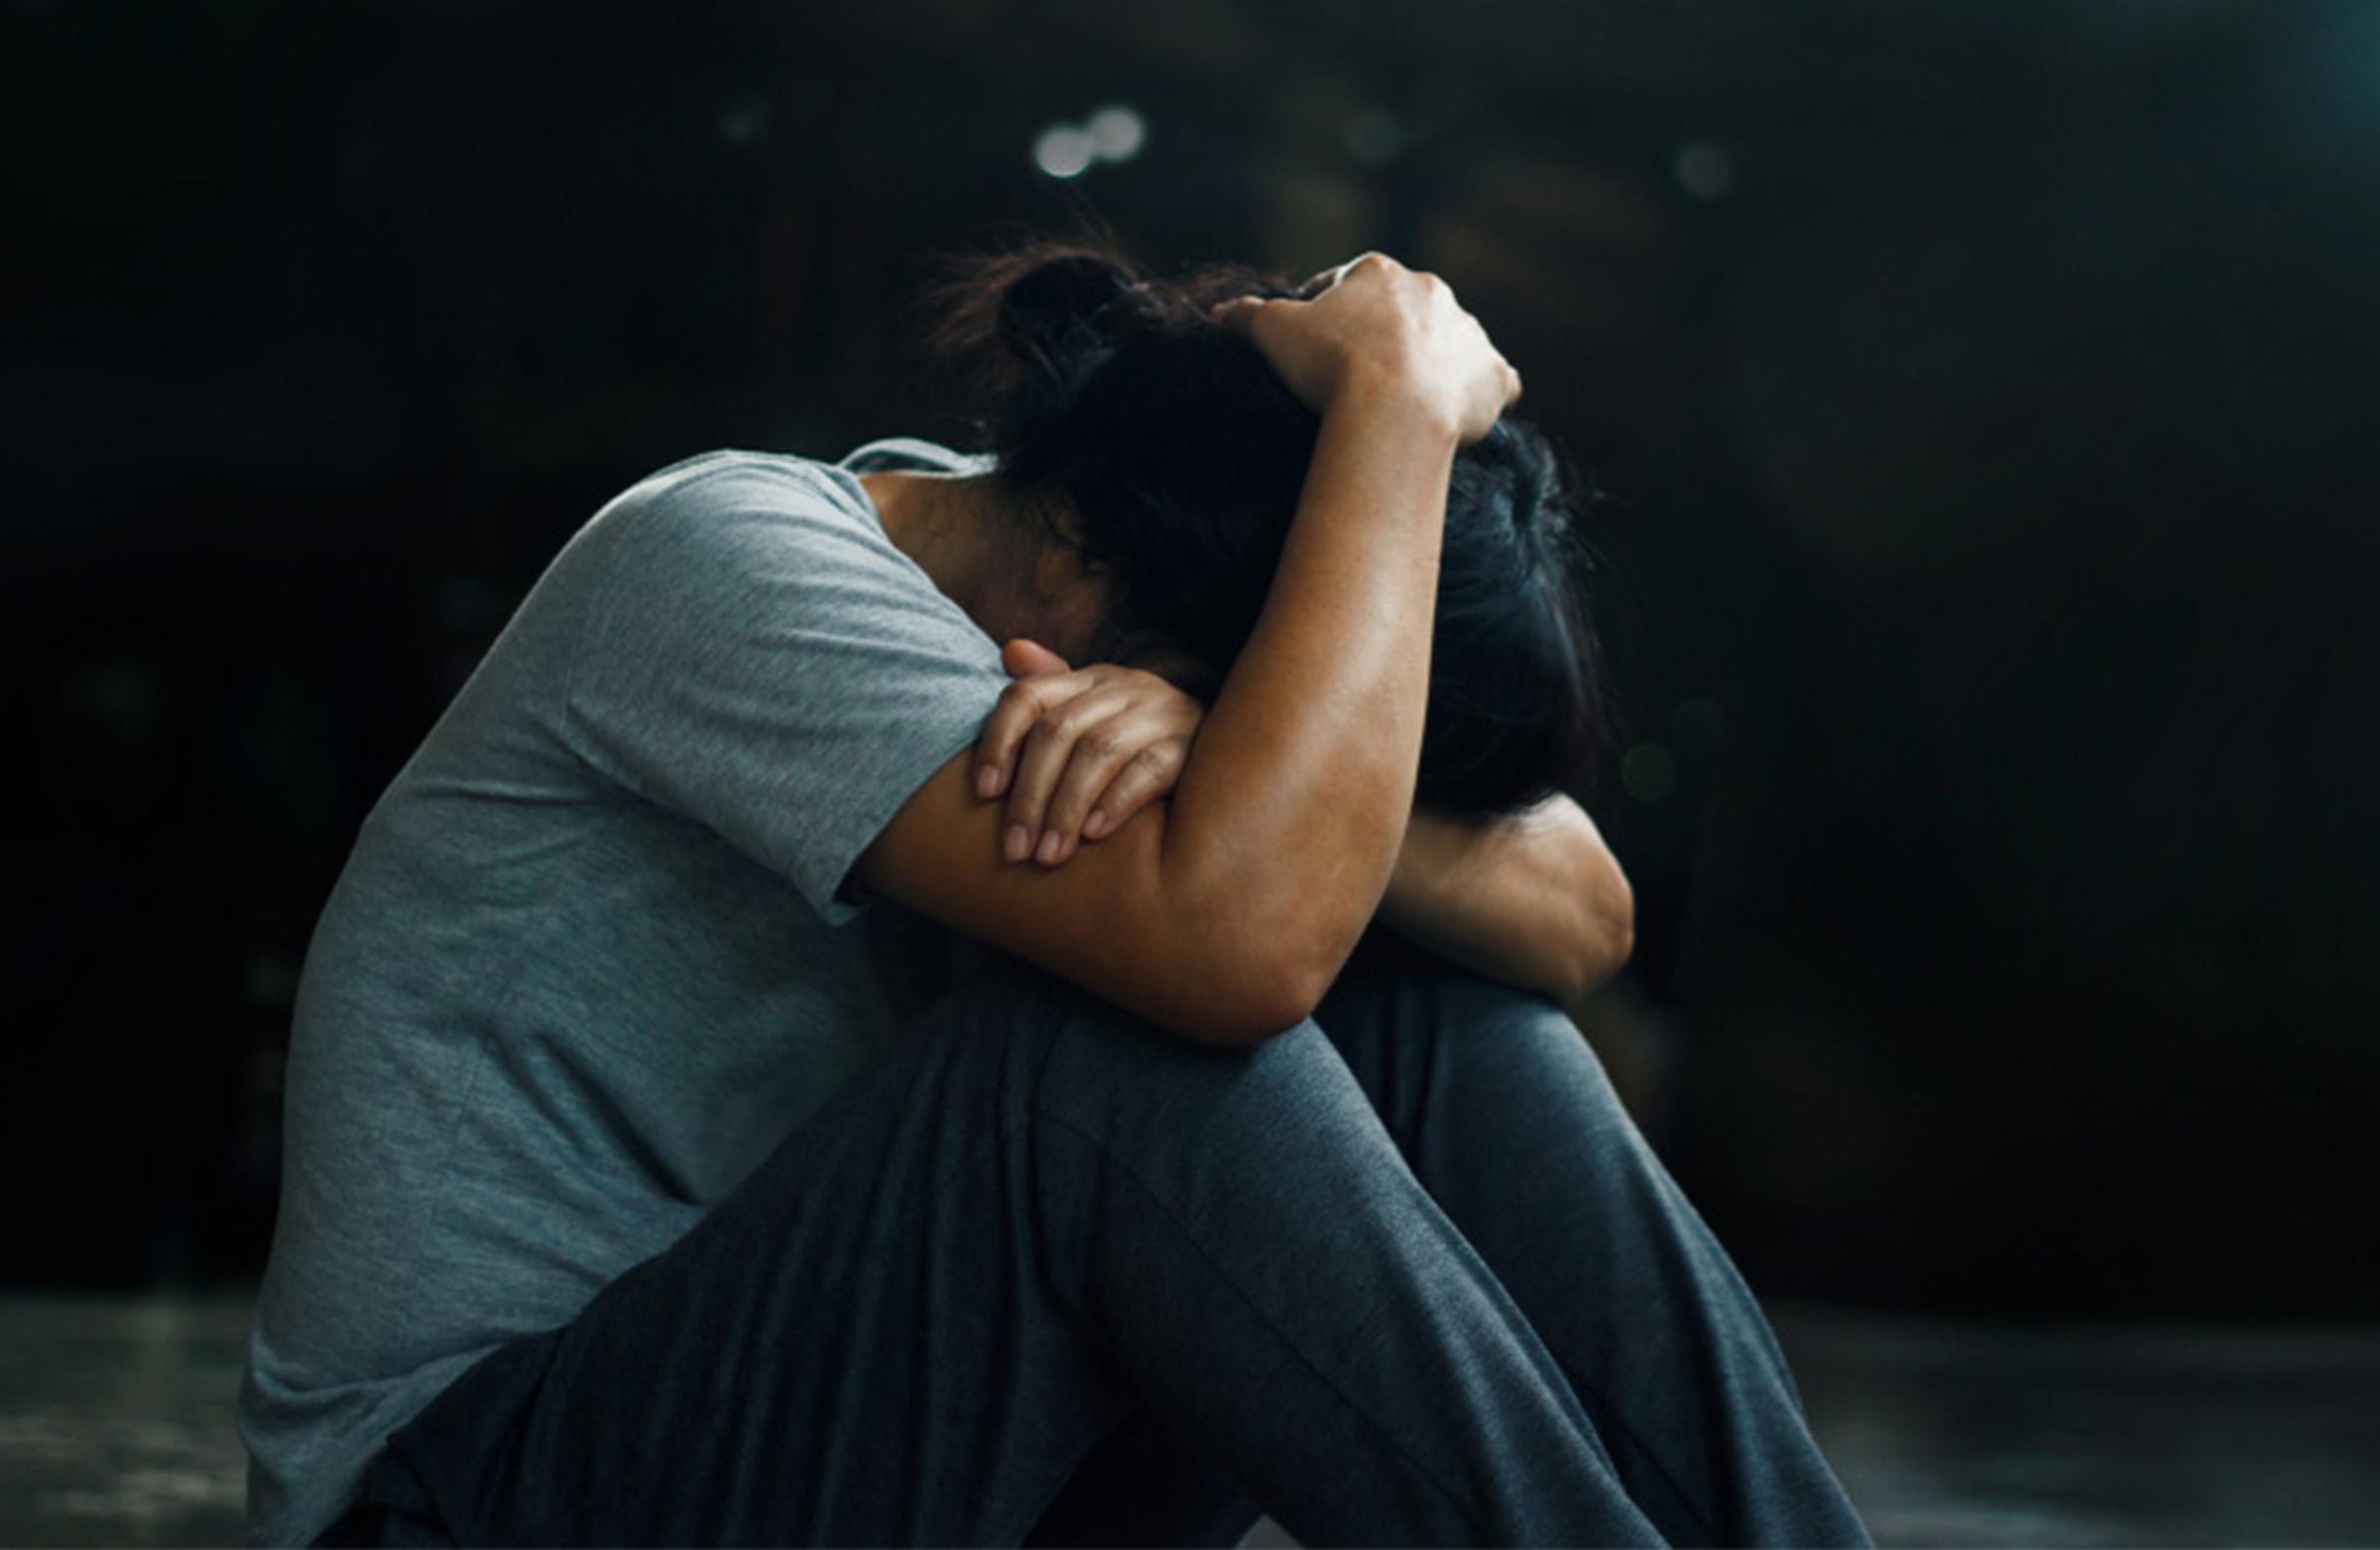 PTSD & Trauma